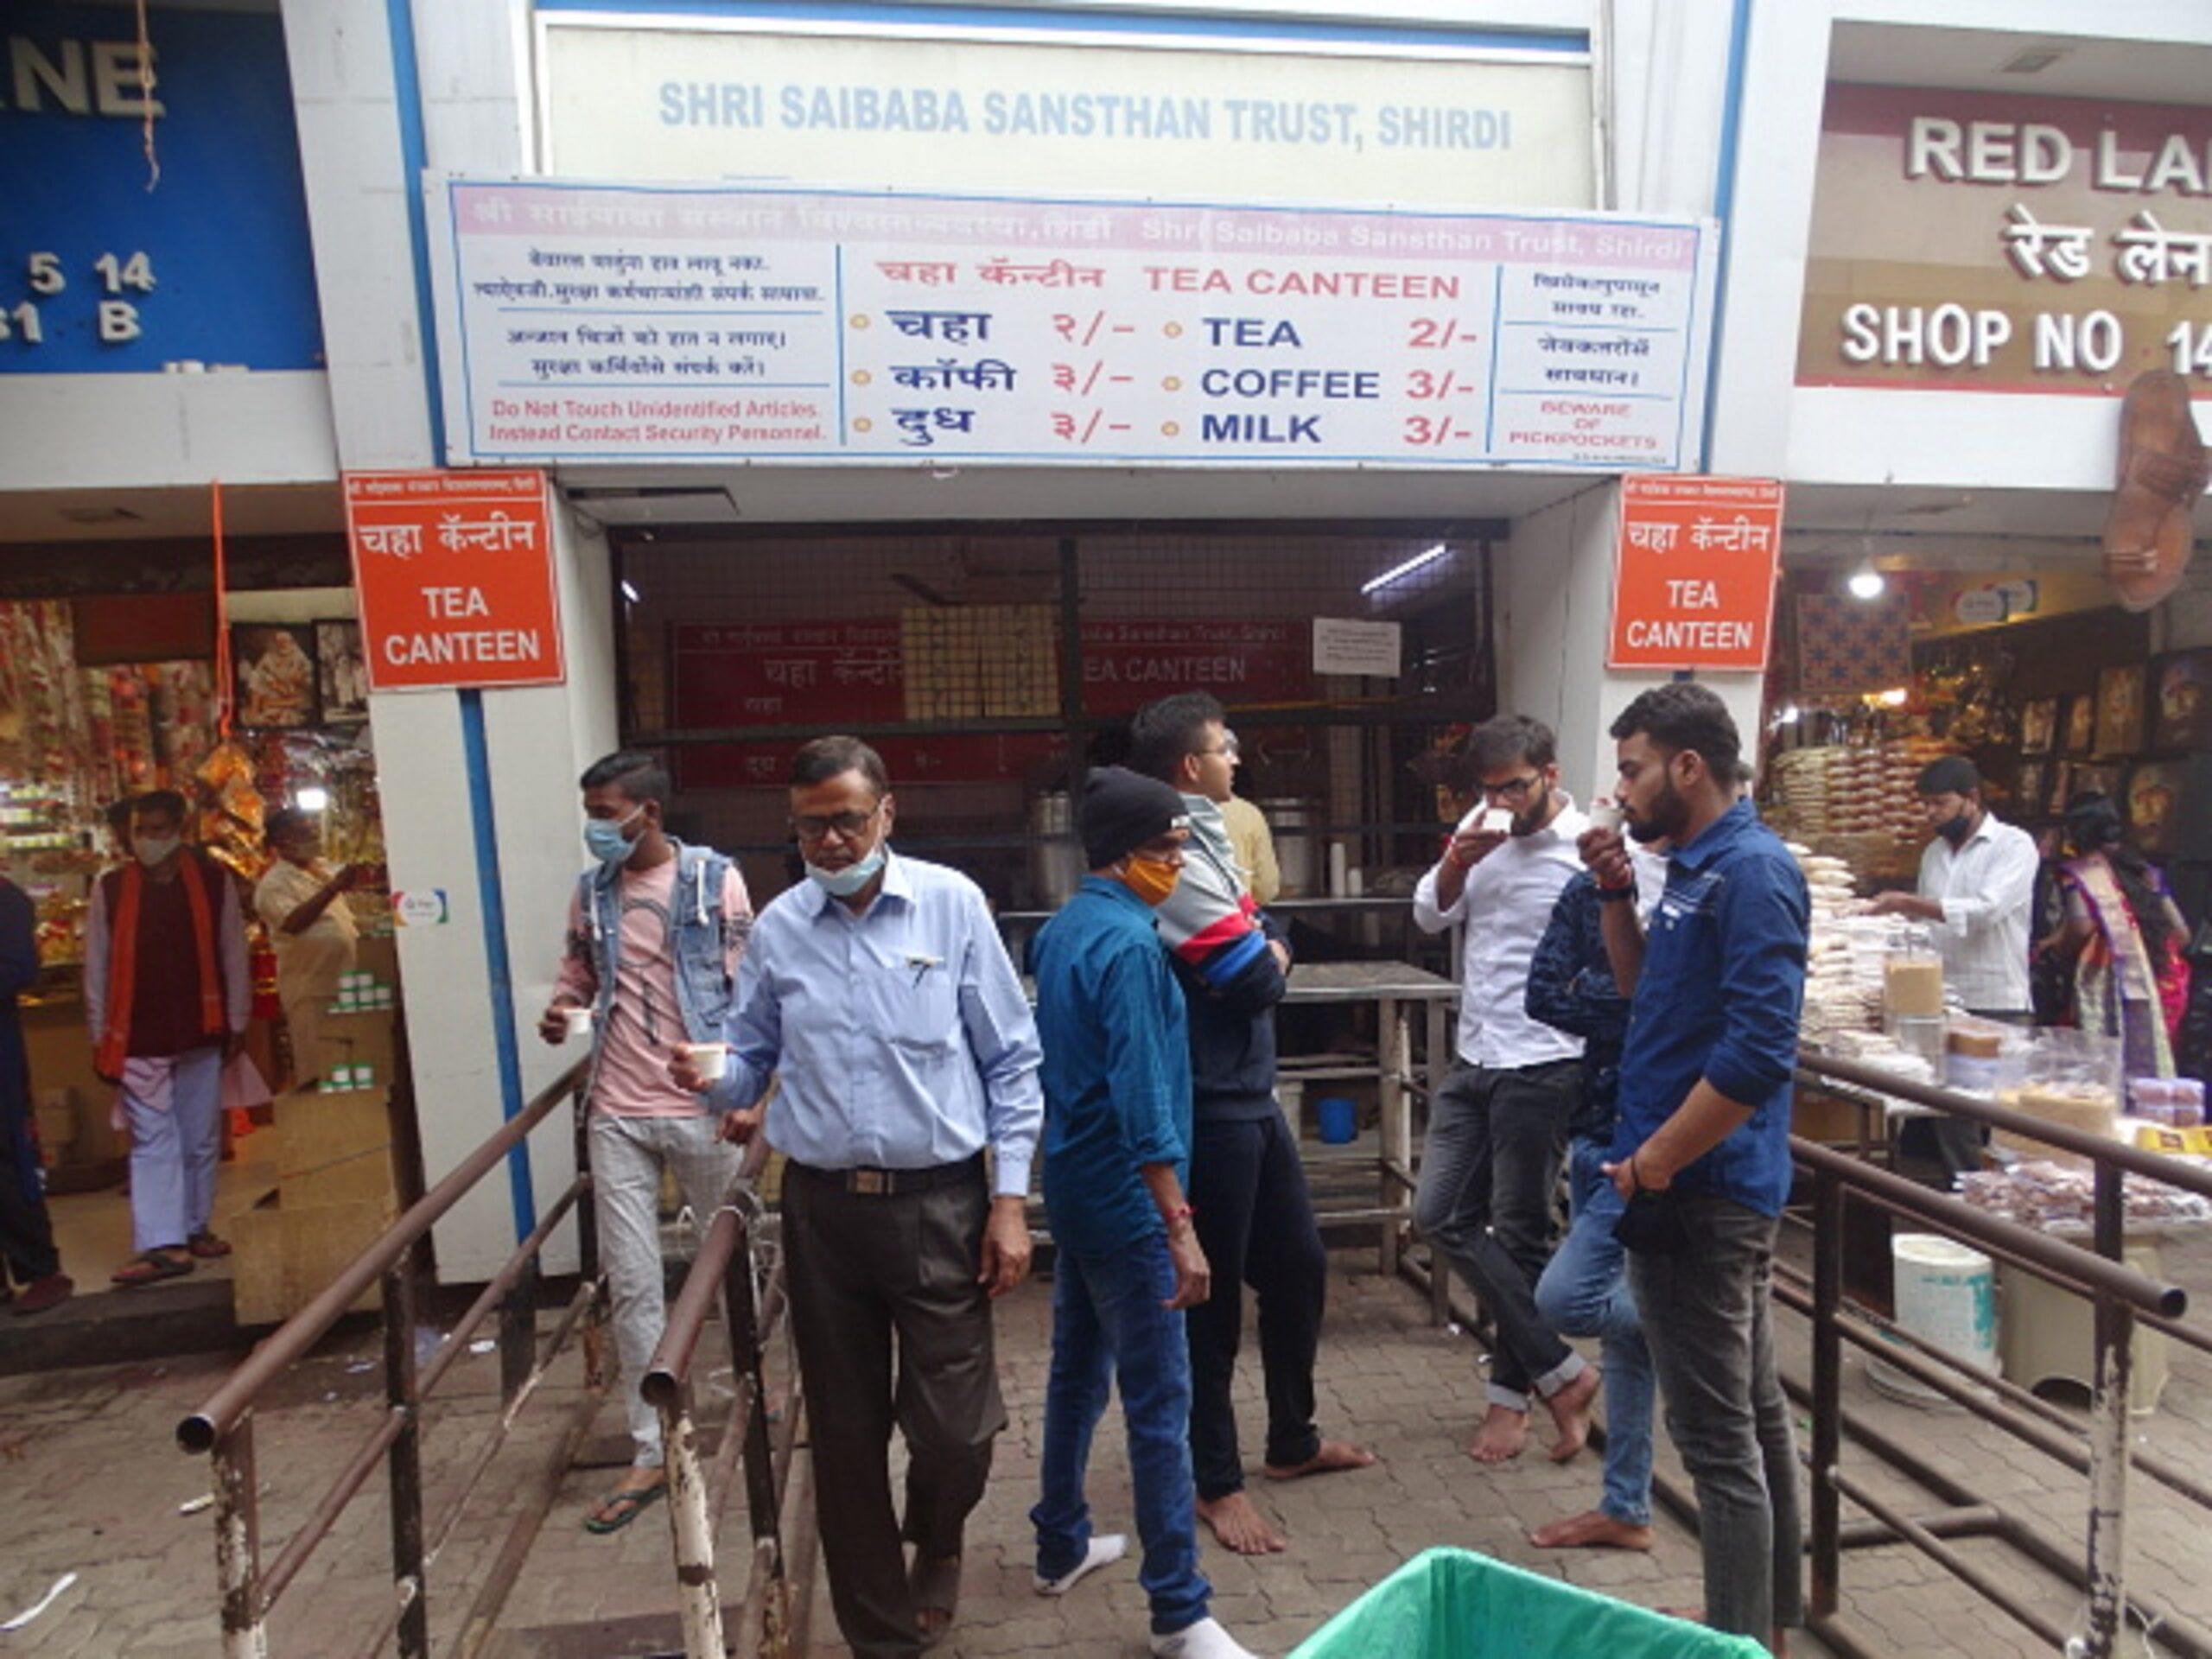 Tea Canteen - Shri Saibaba Sansthan Trust, Shirdi, Maharashtra